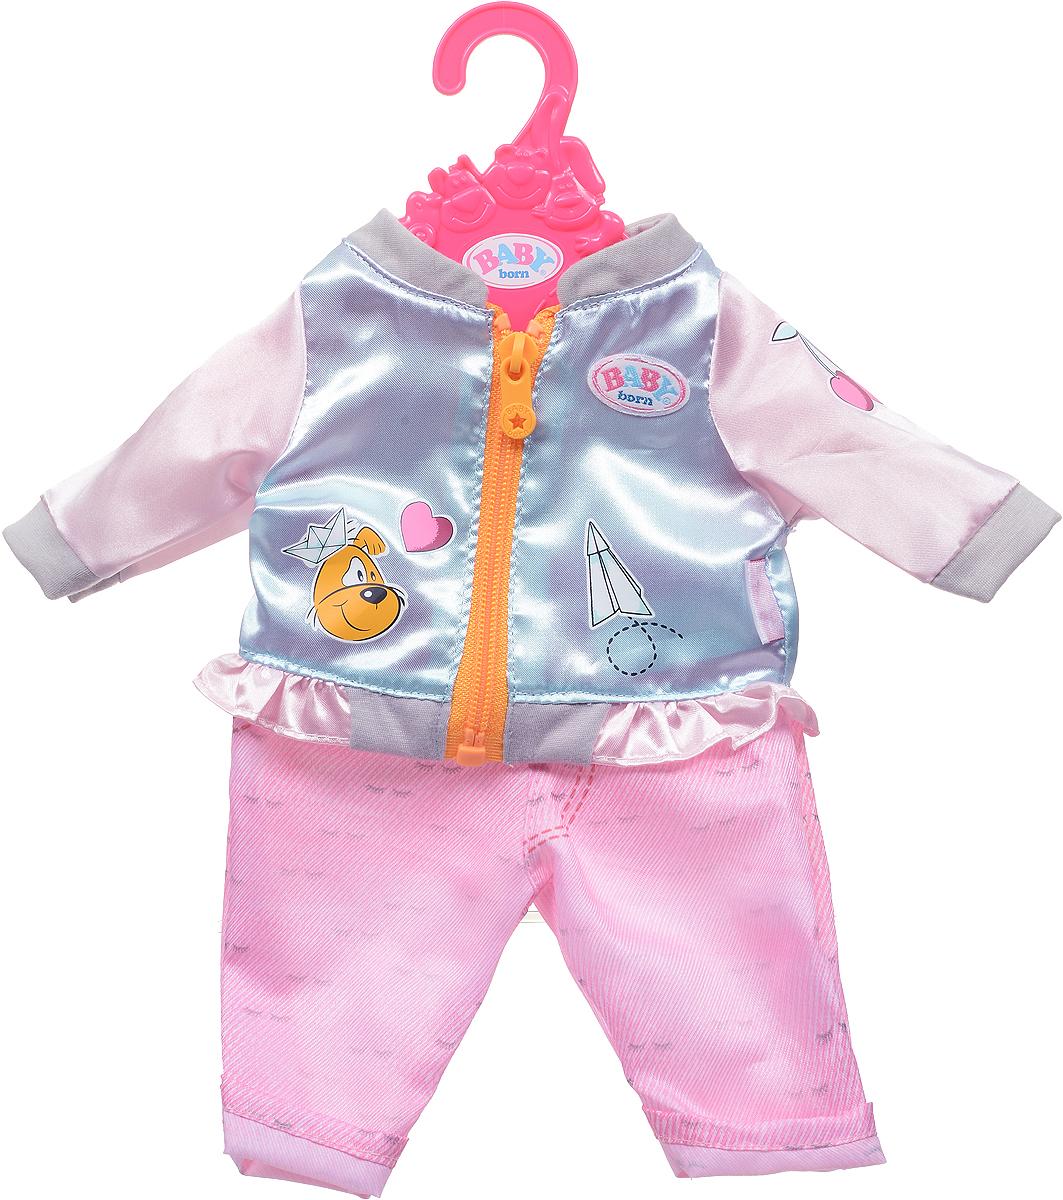 Zapf Creation Одежда для куклы BABY born 824-542, Куртка голубая, штаны розовые zapf creation одежда для куклы baby born 824 566 цвет розовый